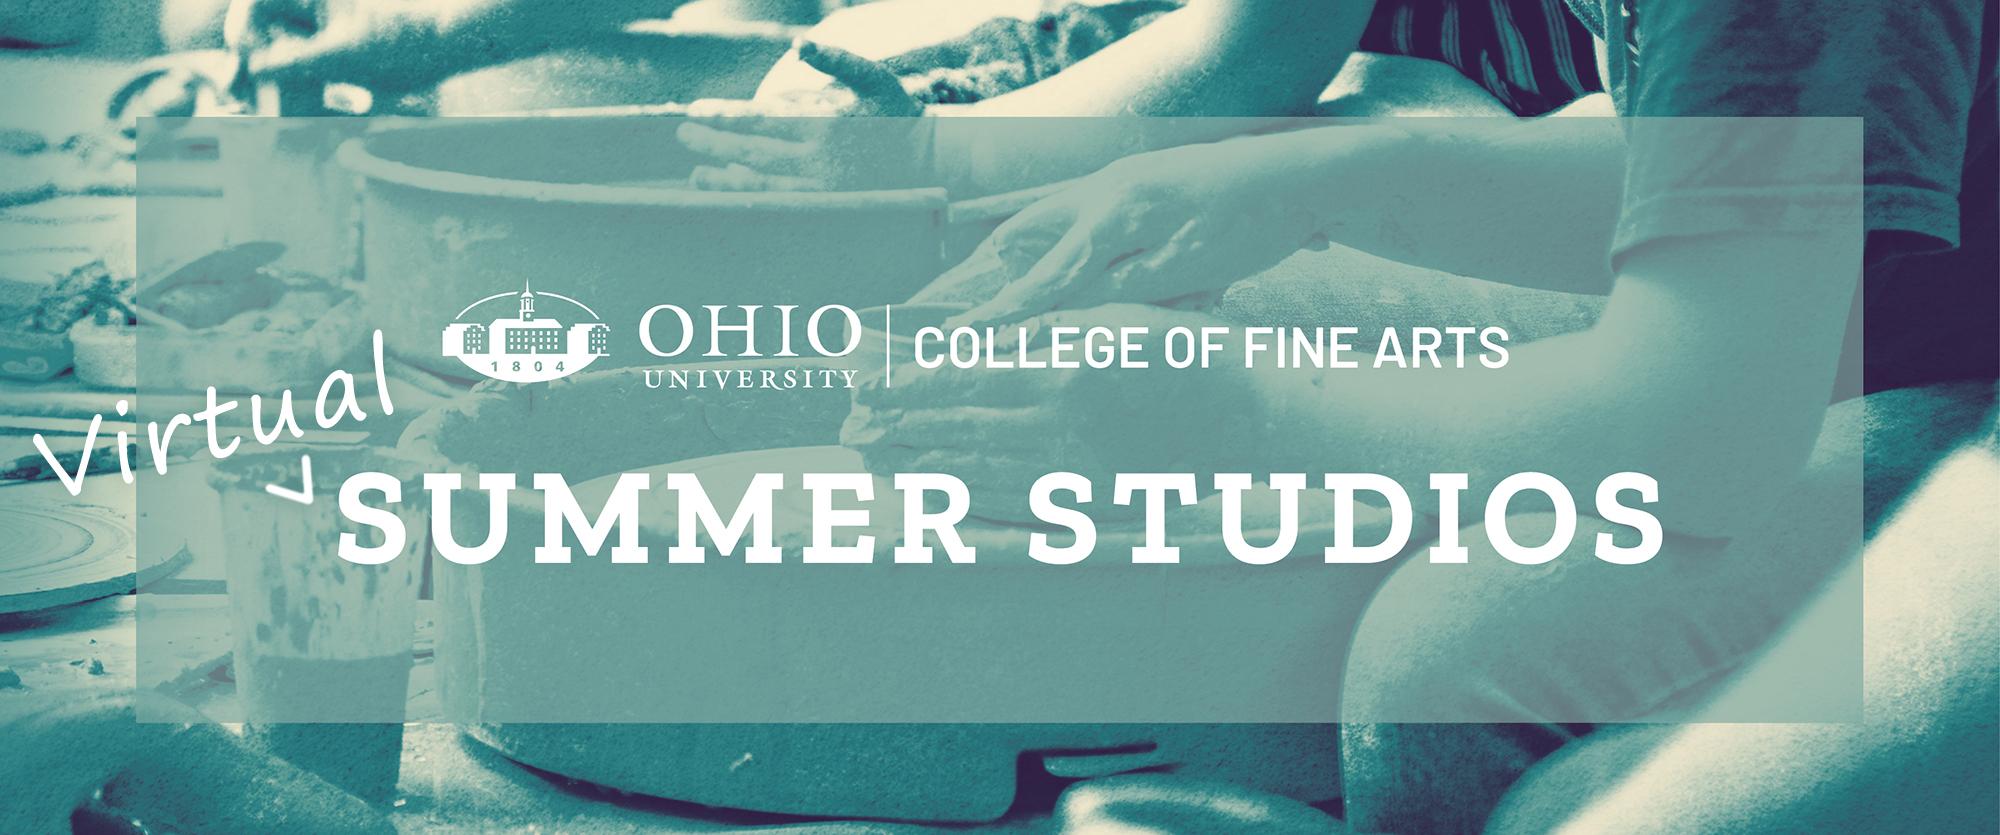 Ohio University Pre-College & Youth Summer Programs